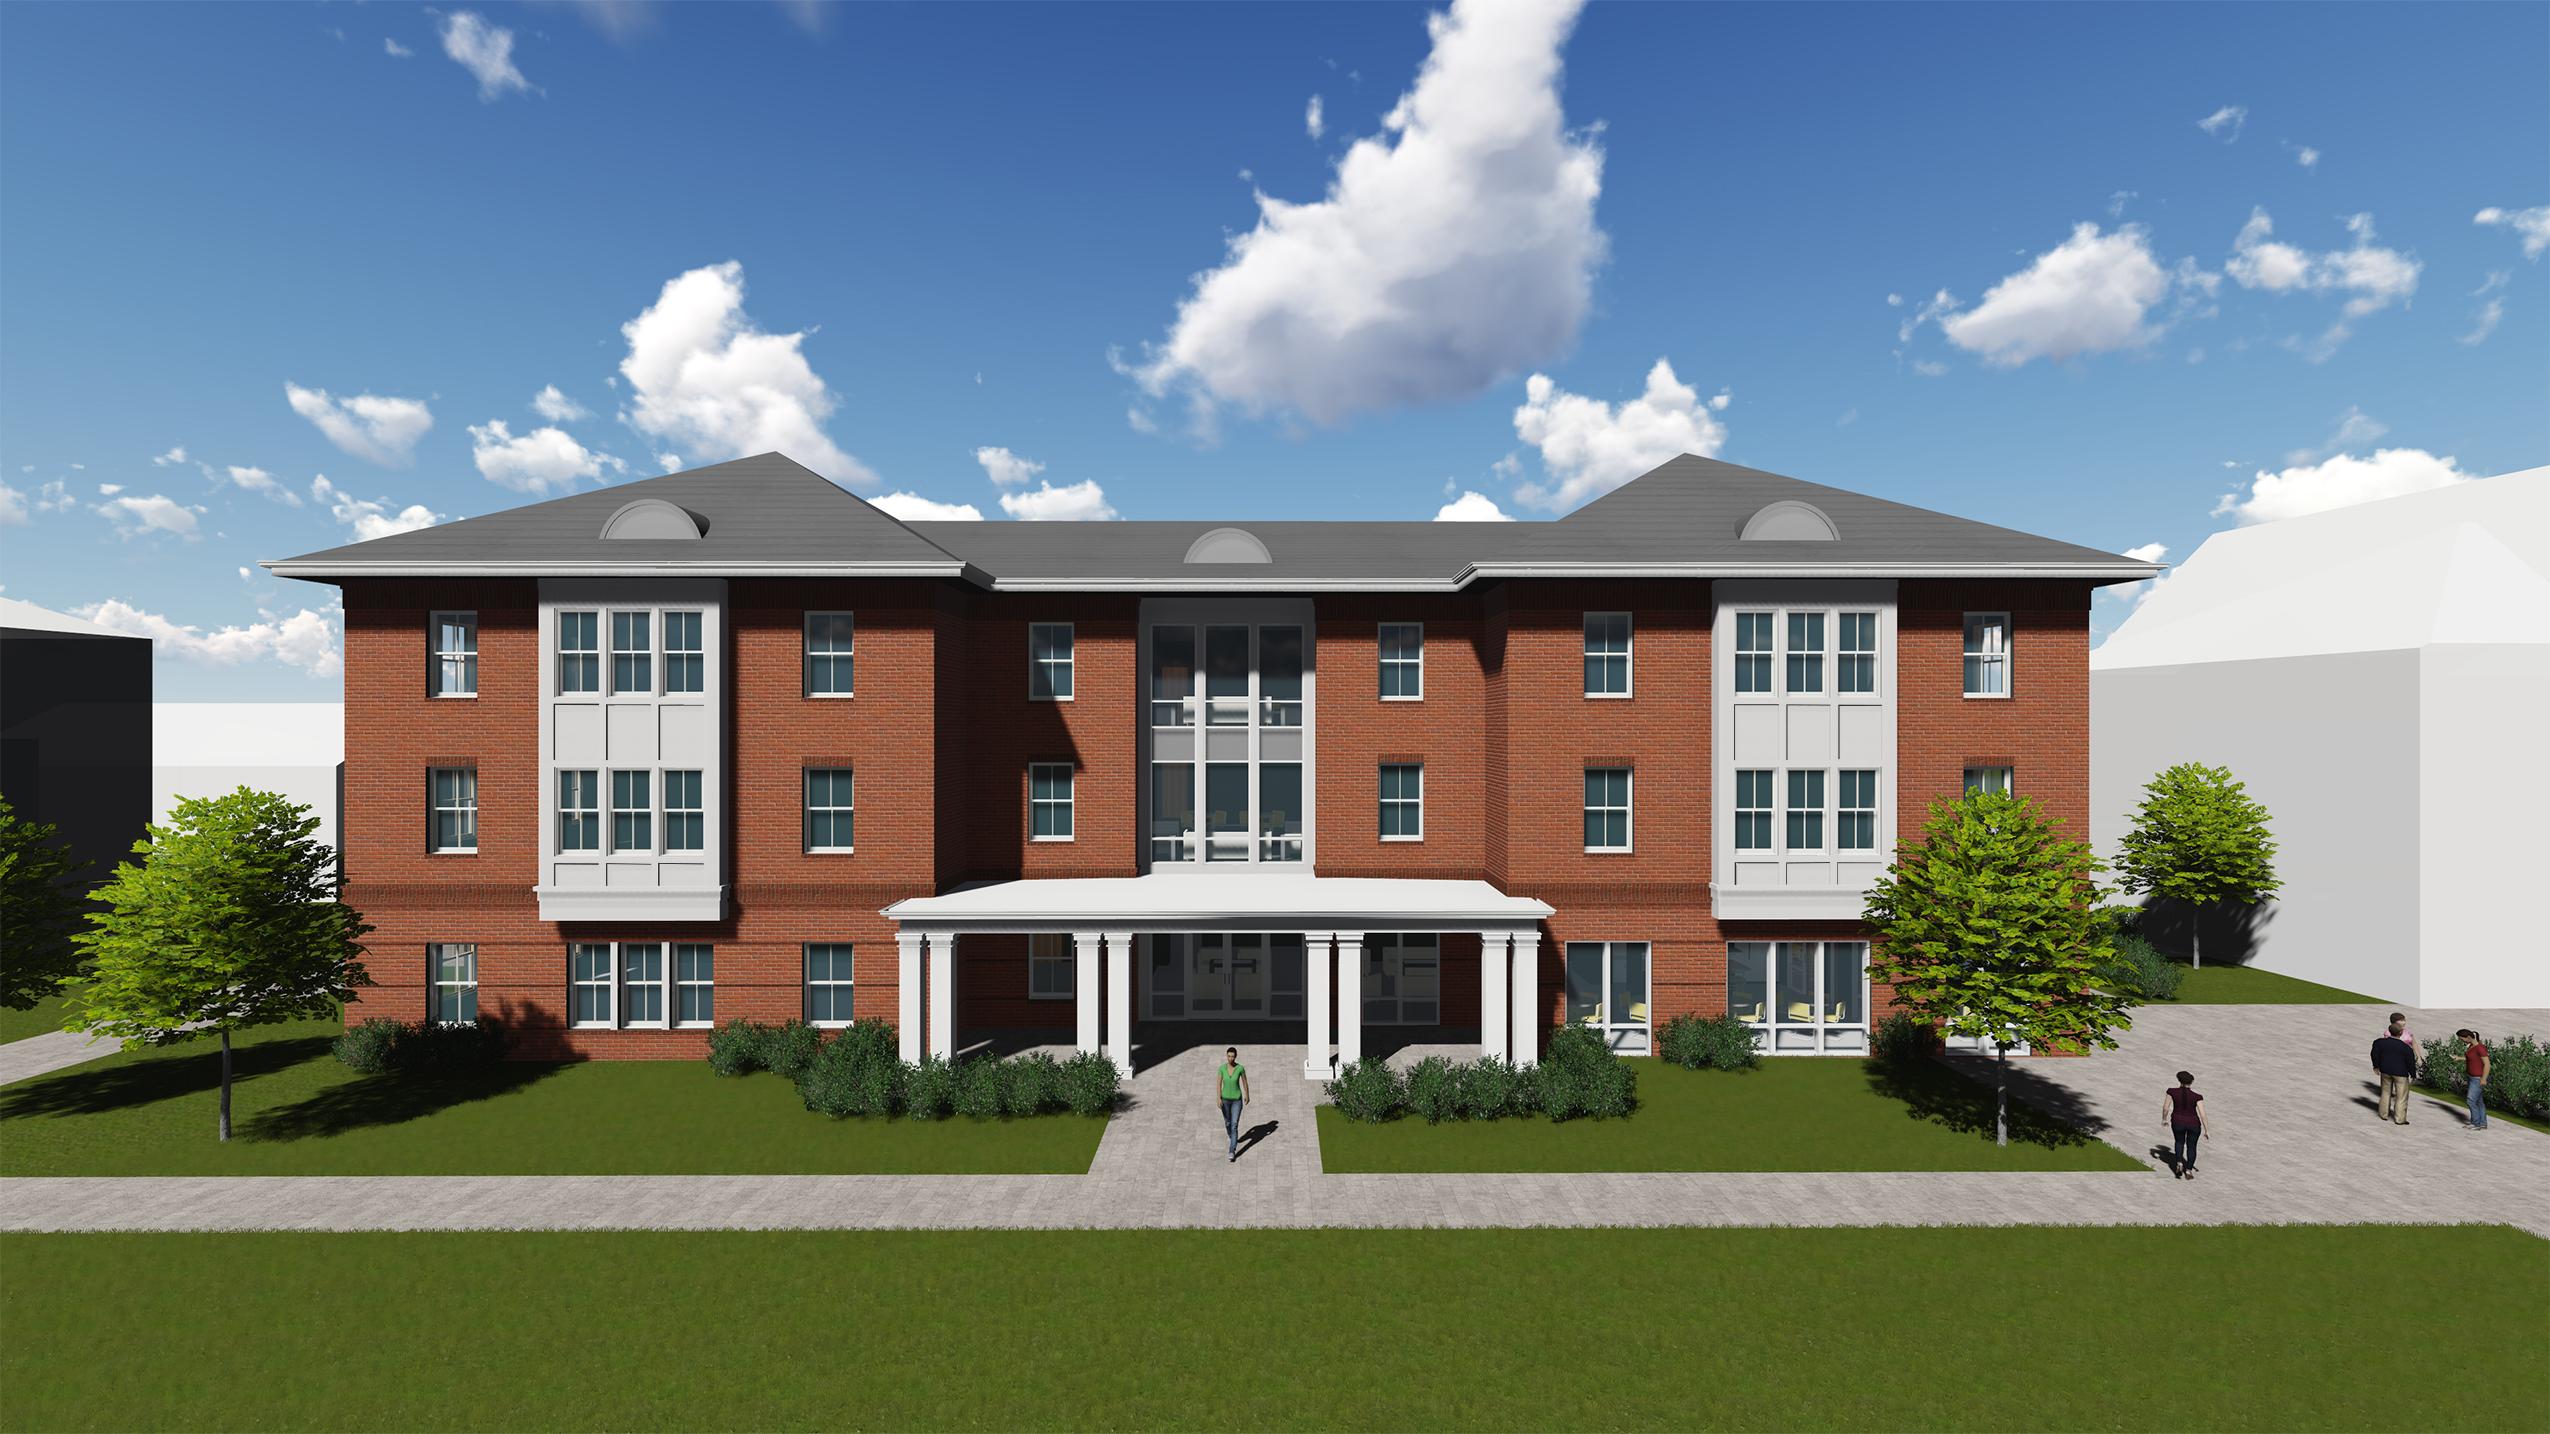 Residence Hall prototype